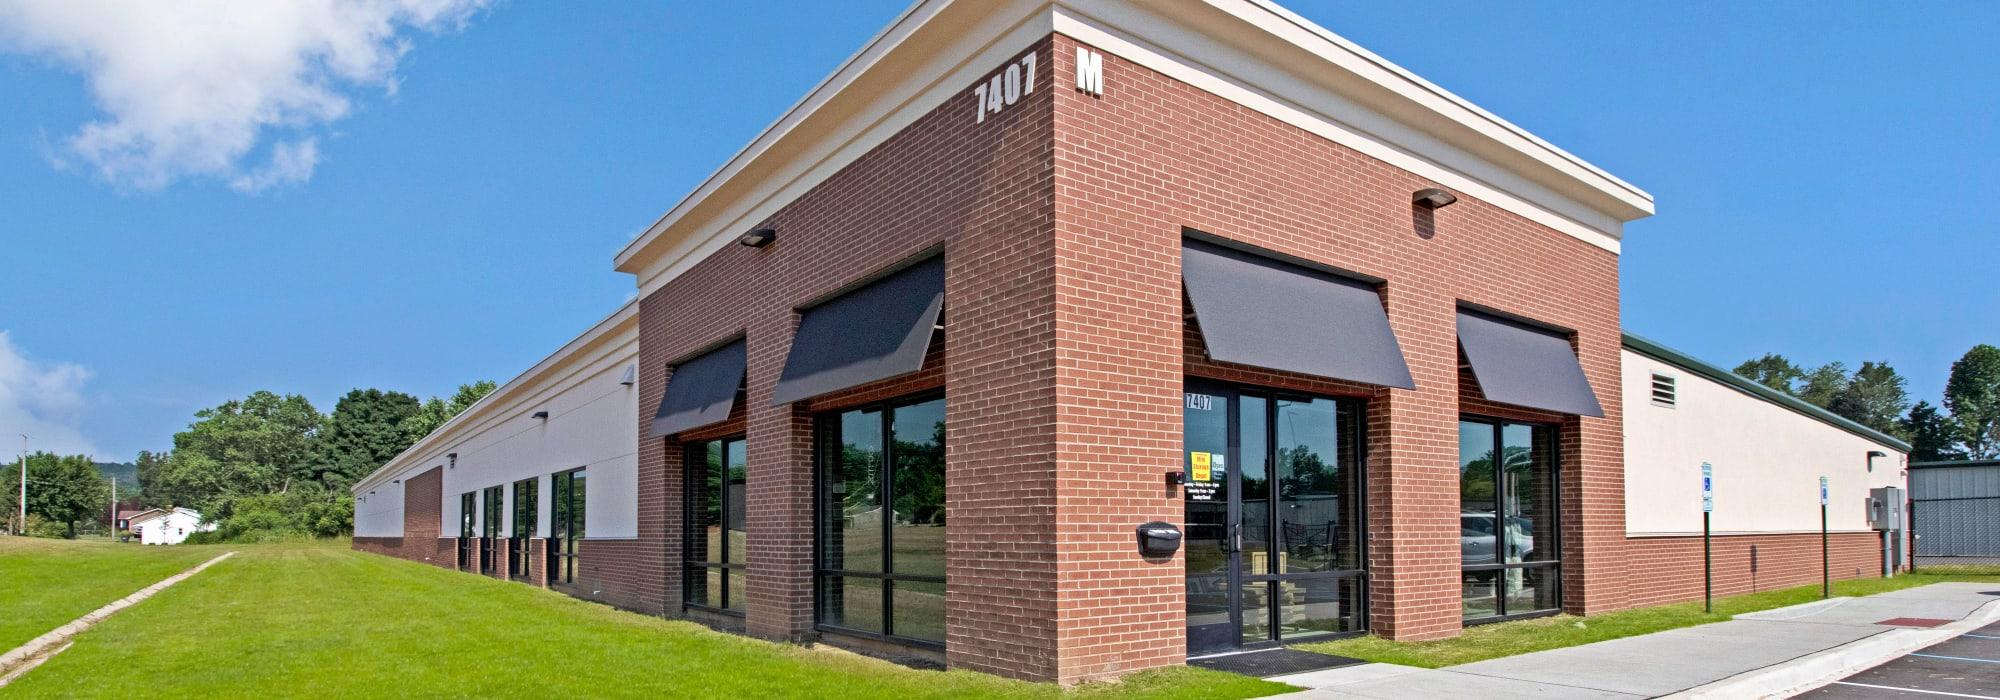 Welcome to Mini Storage Depot in Louisville, Kentucky